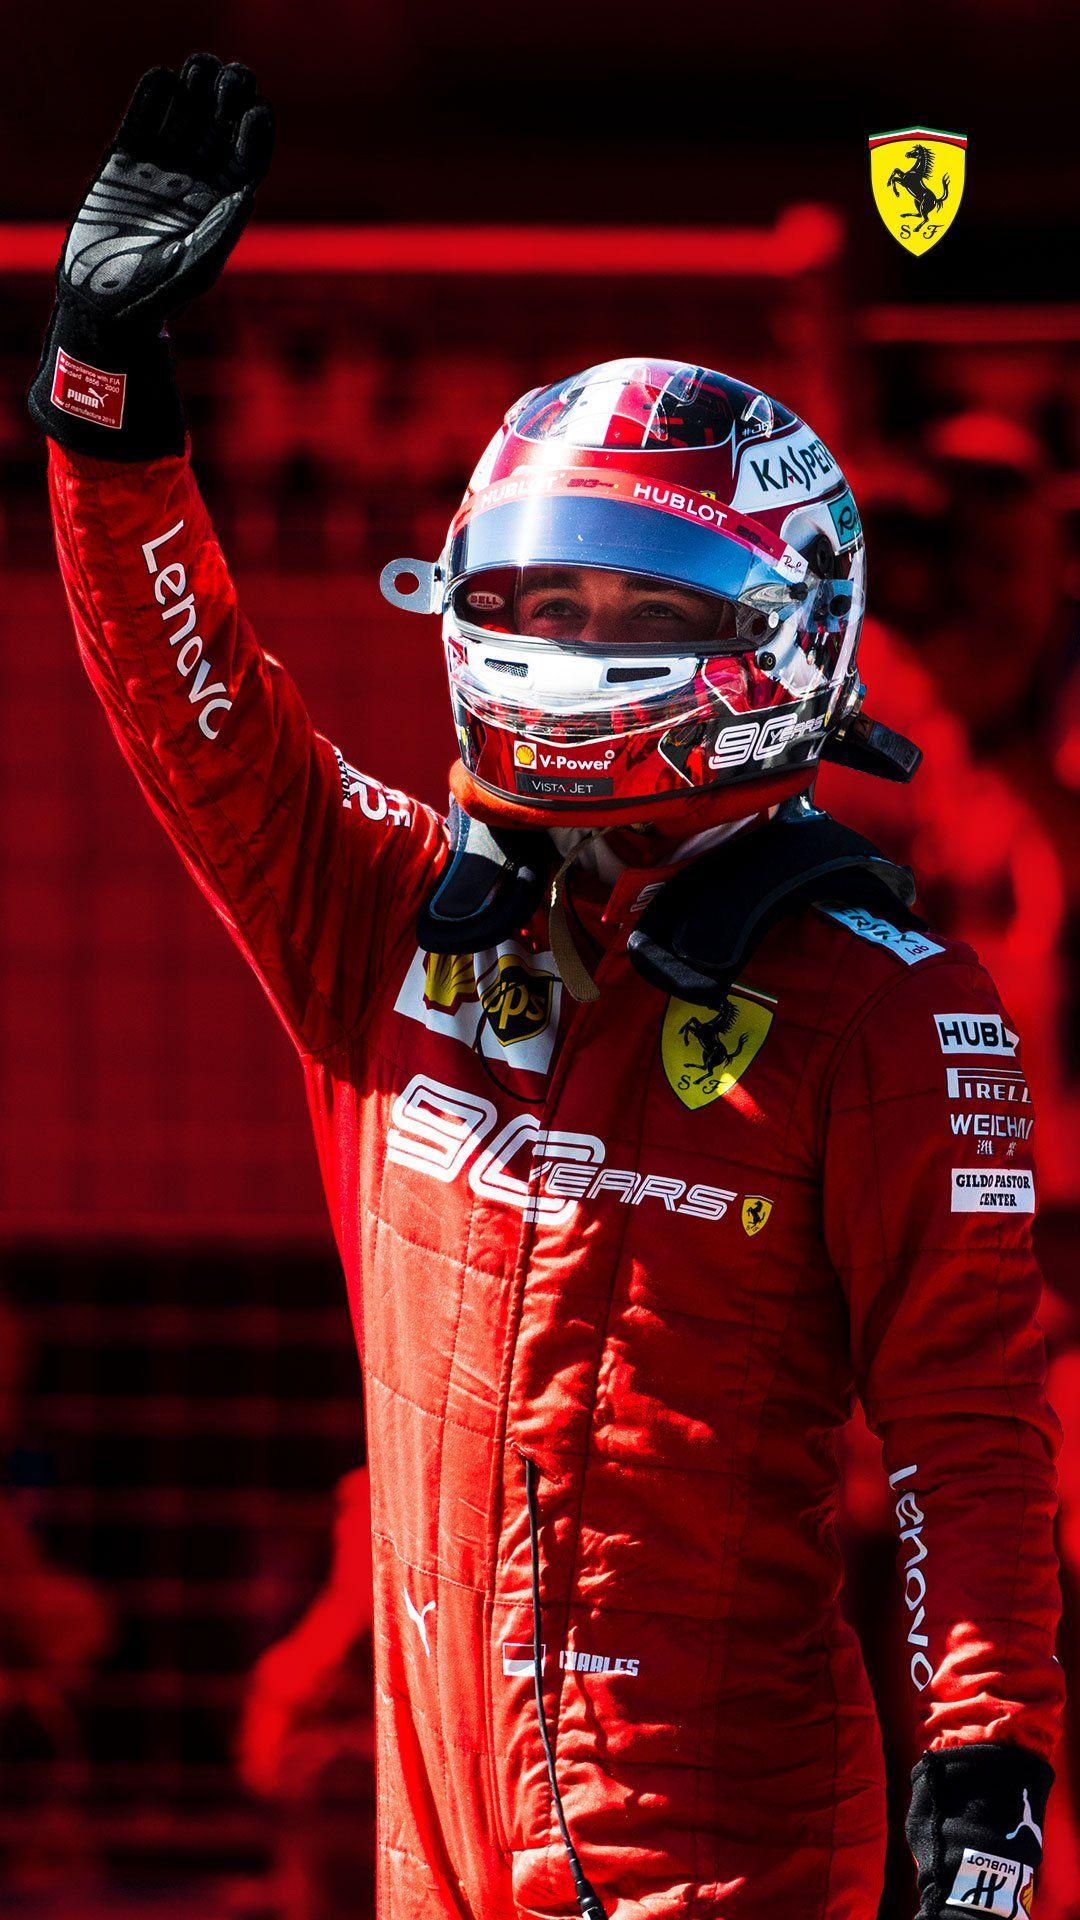 Scuderia Ferrari On Cosas De Coche Carreras De F1 Fondos De